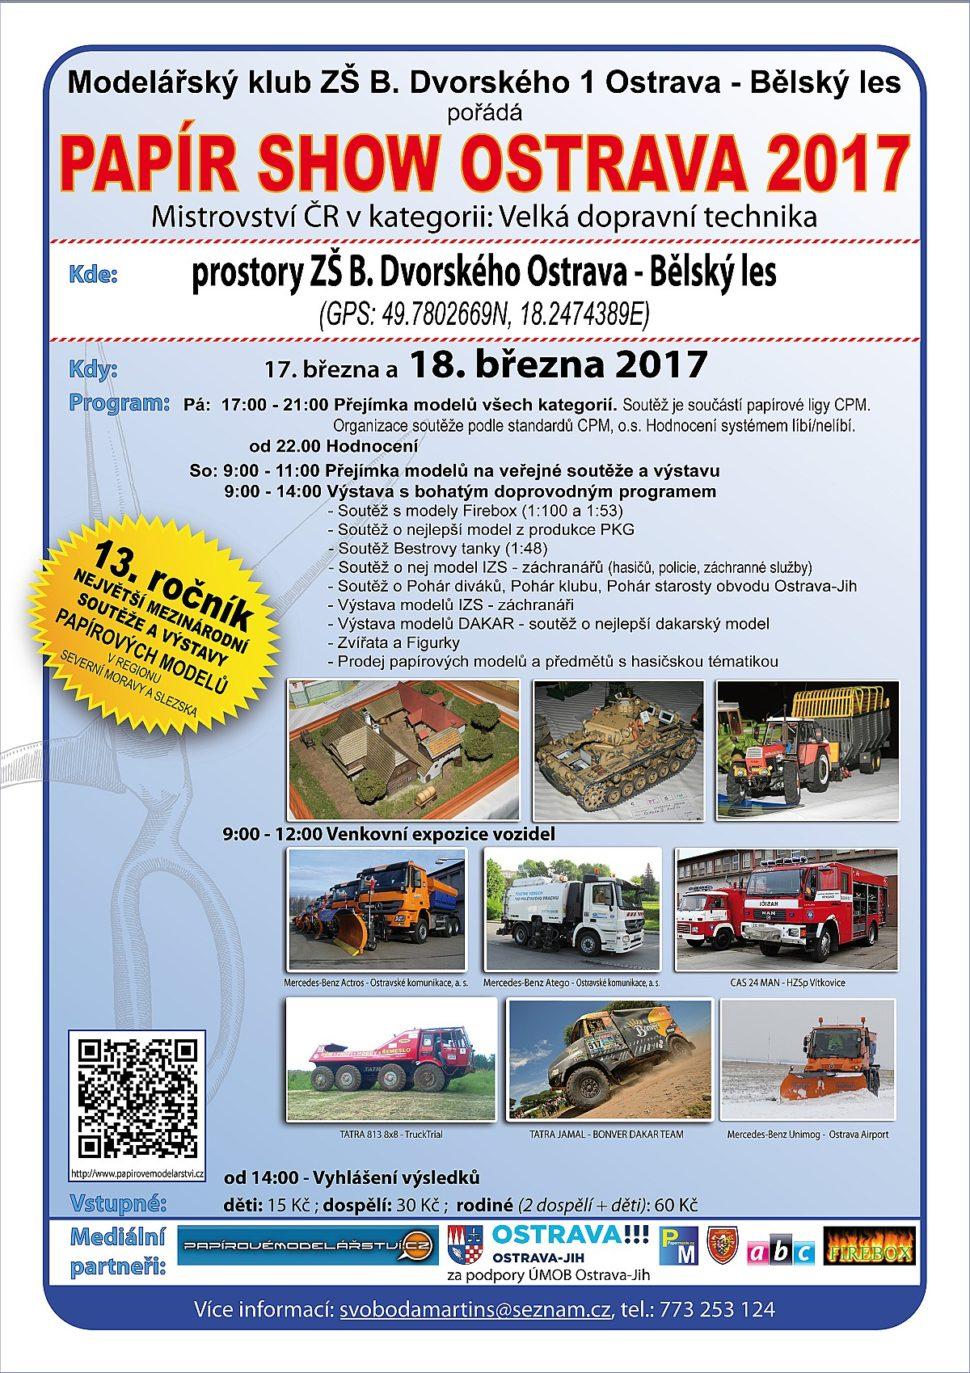 Papír show Ostrava 2017